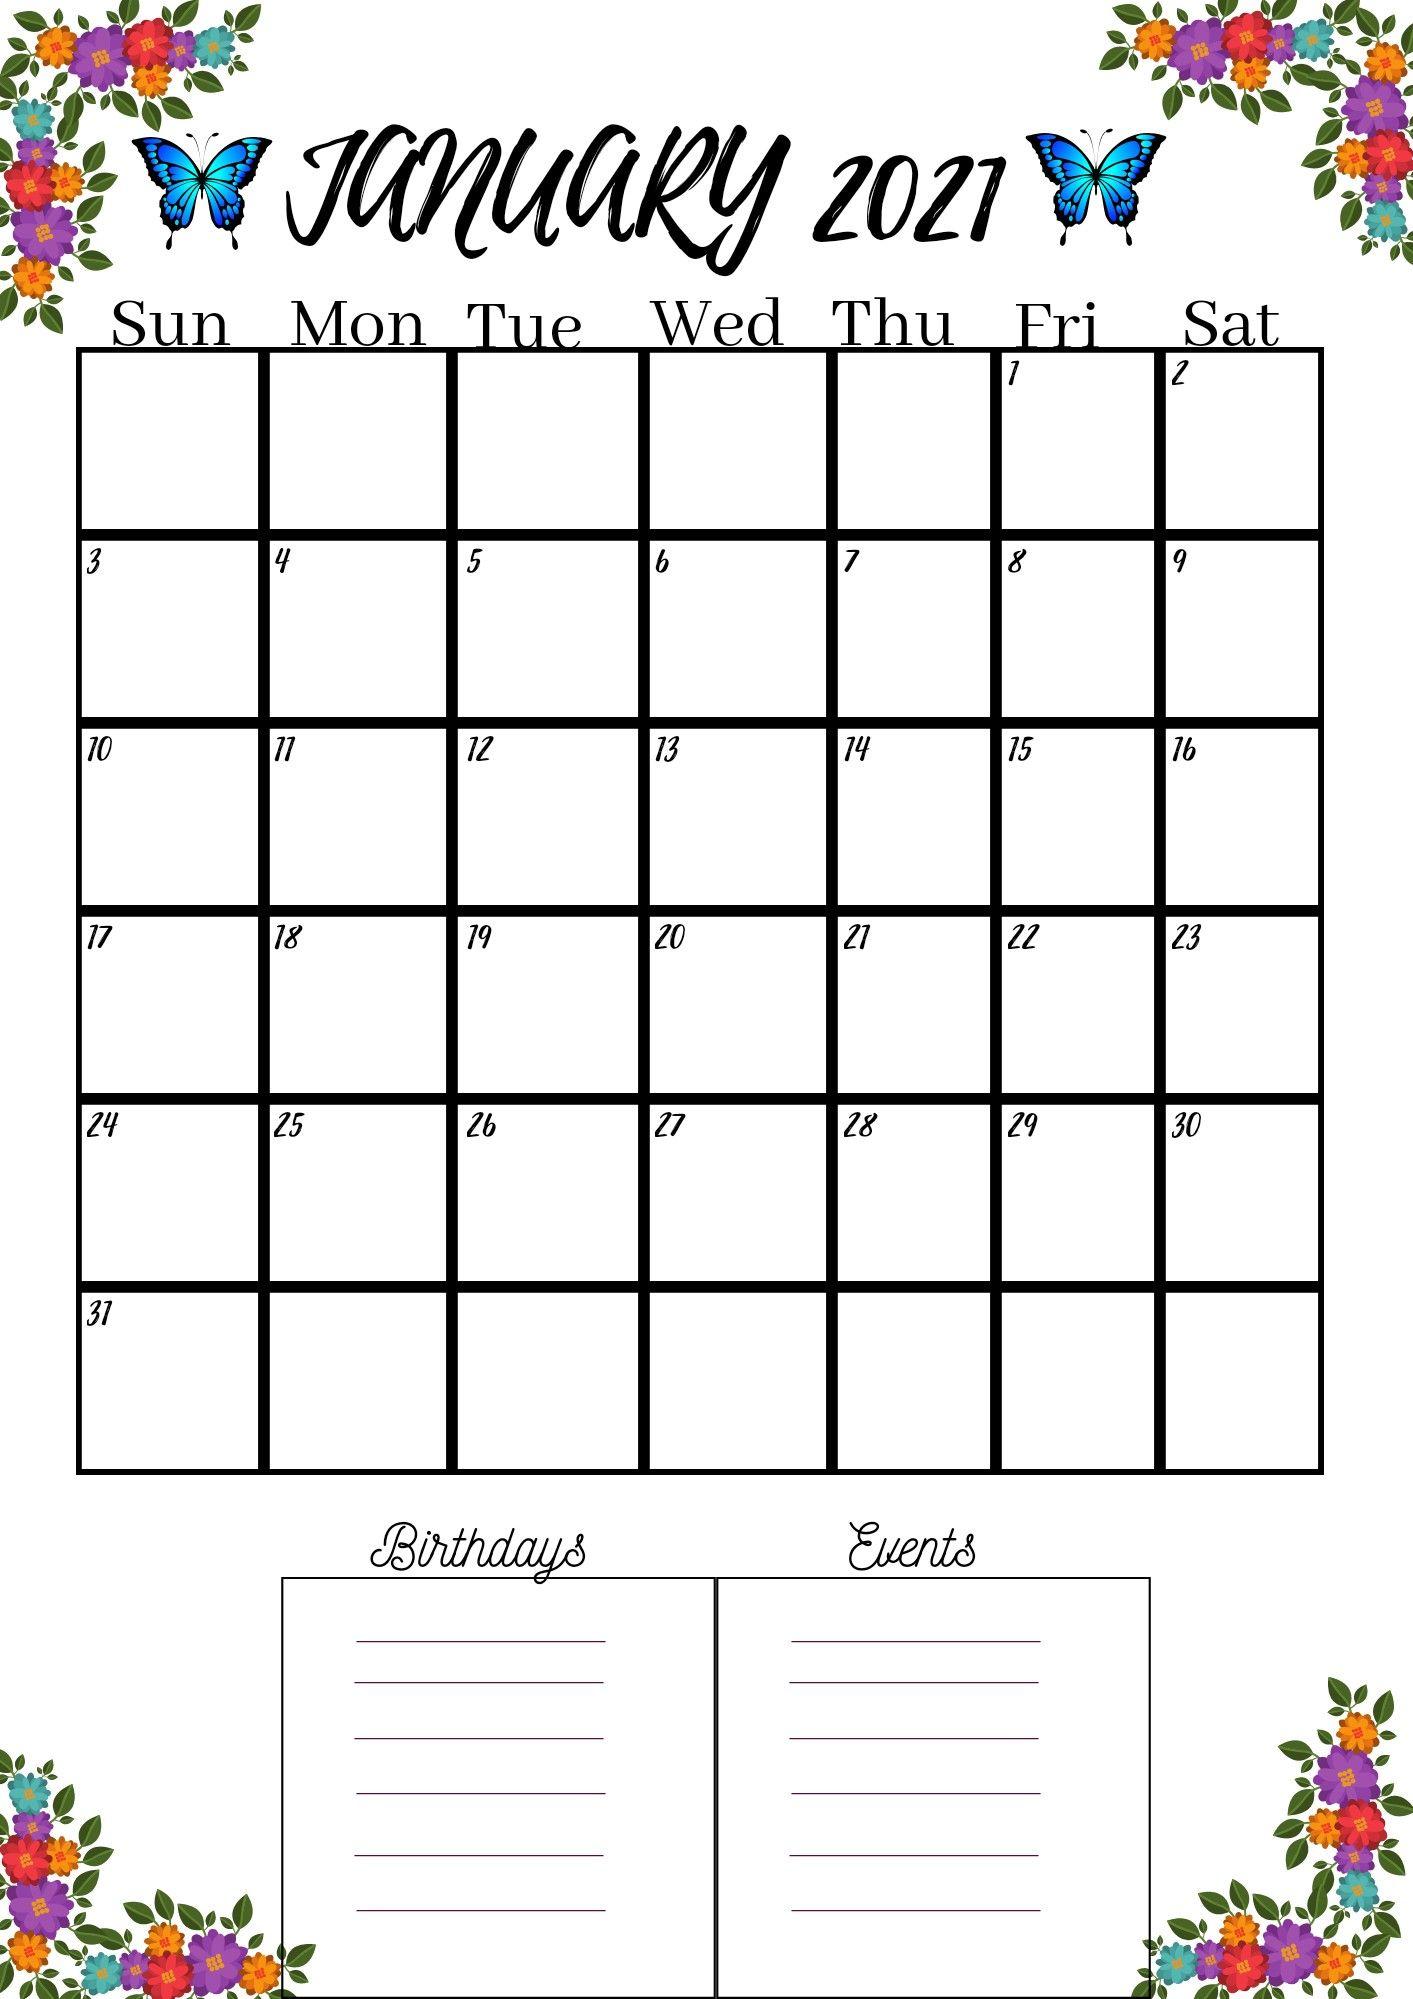 Year 2021 Calendar Etsy In 2020 Calendar 2021 Calendar Printable Calendar Pdf